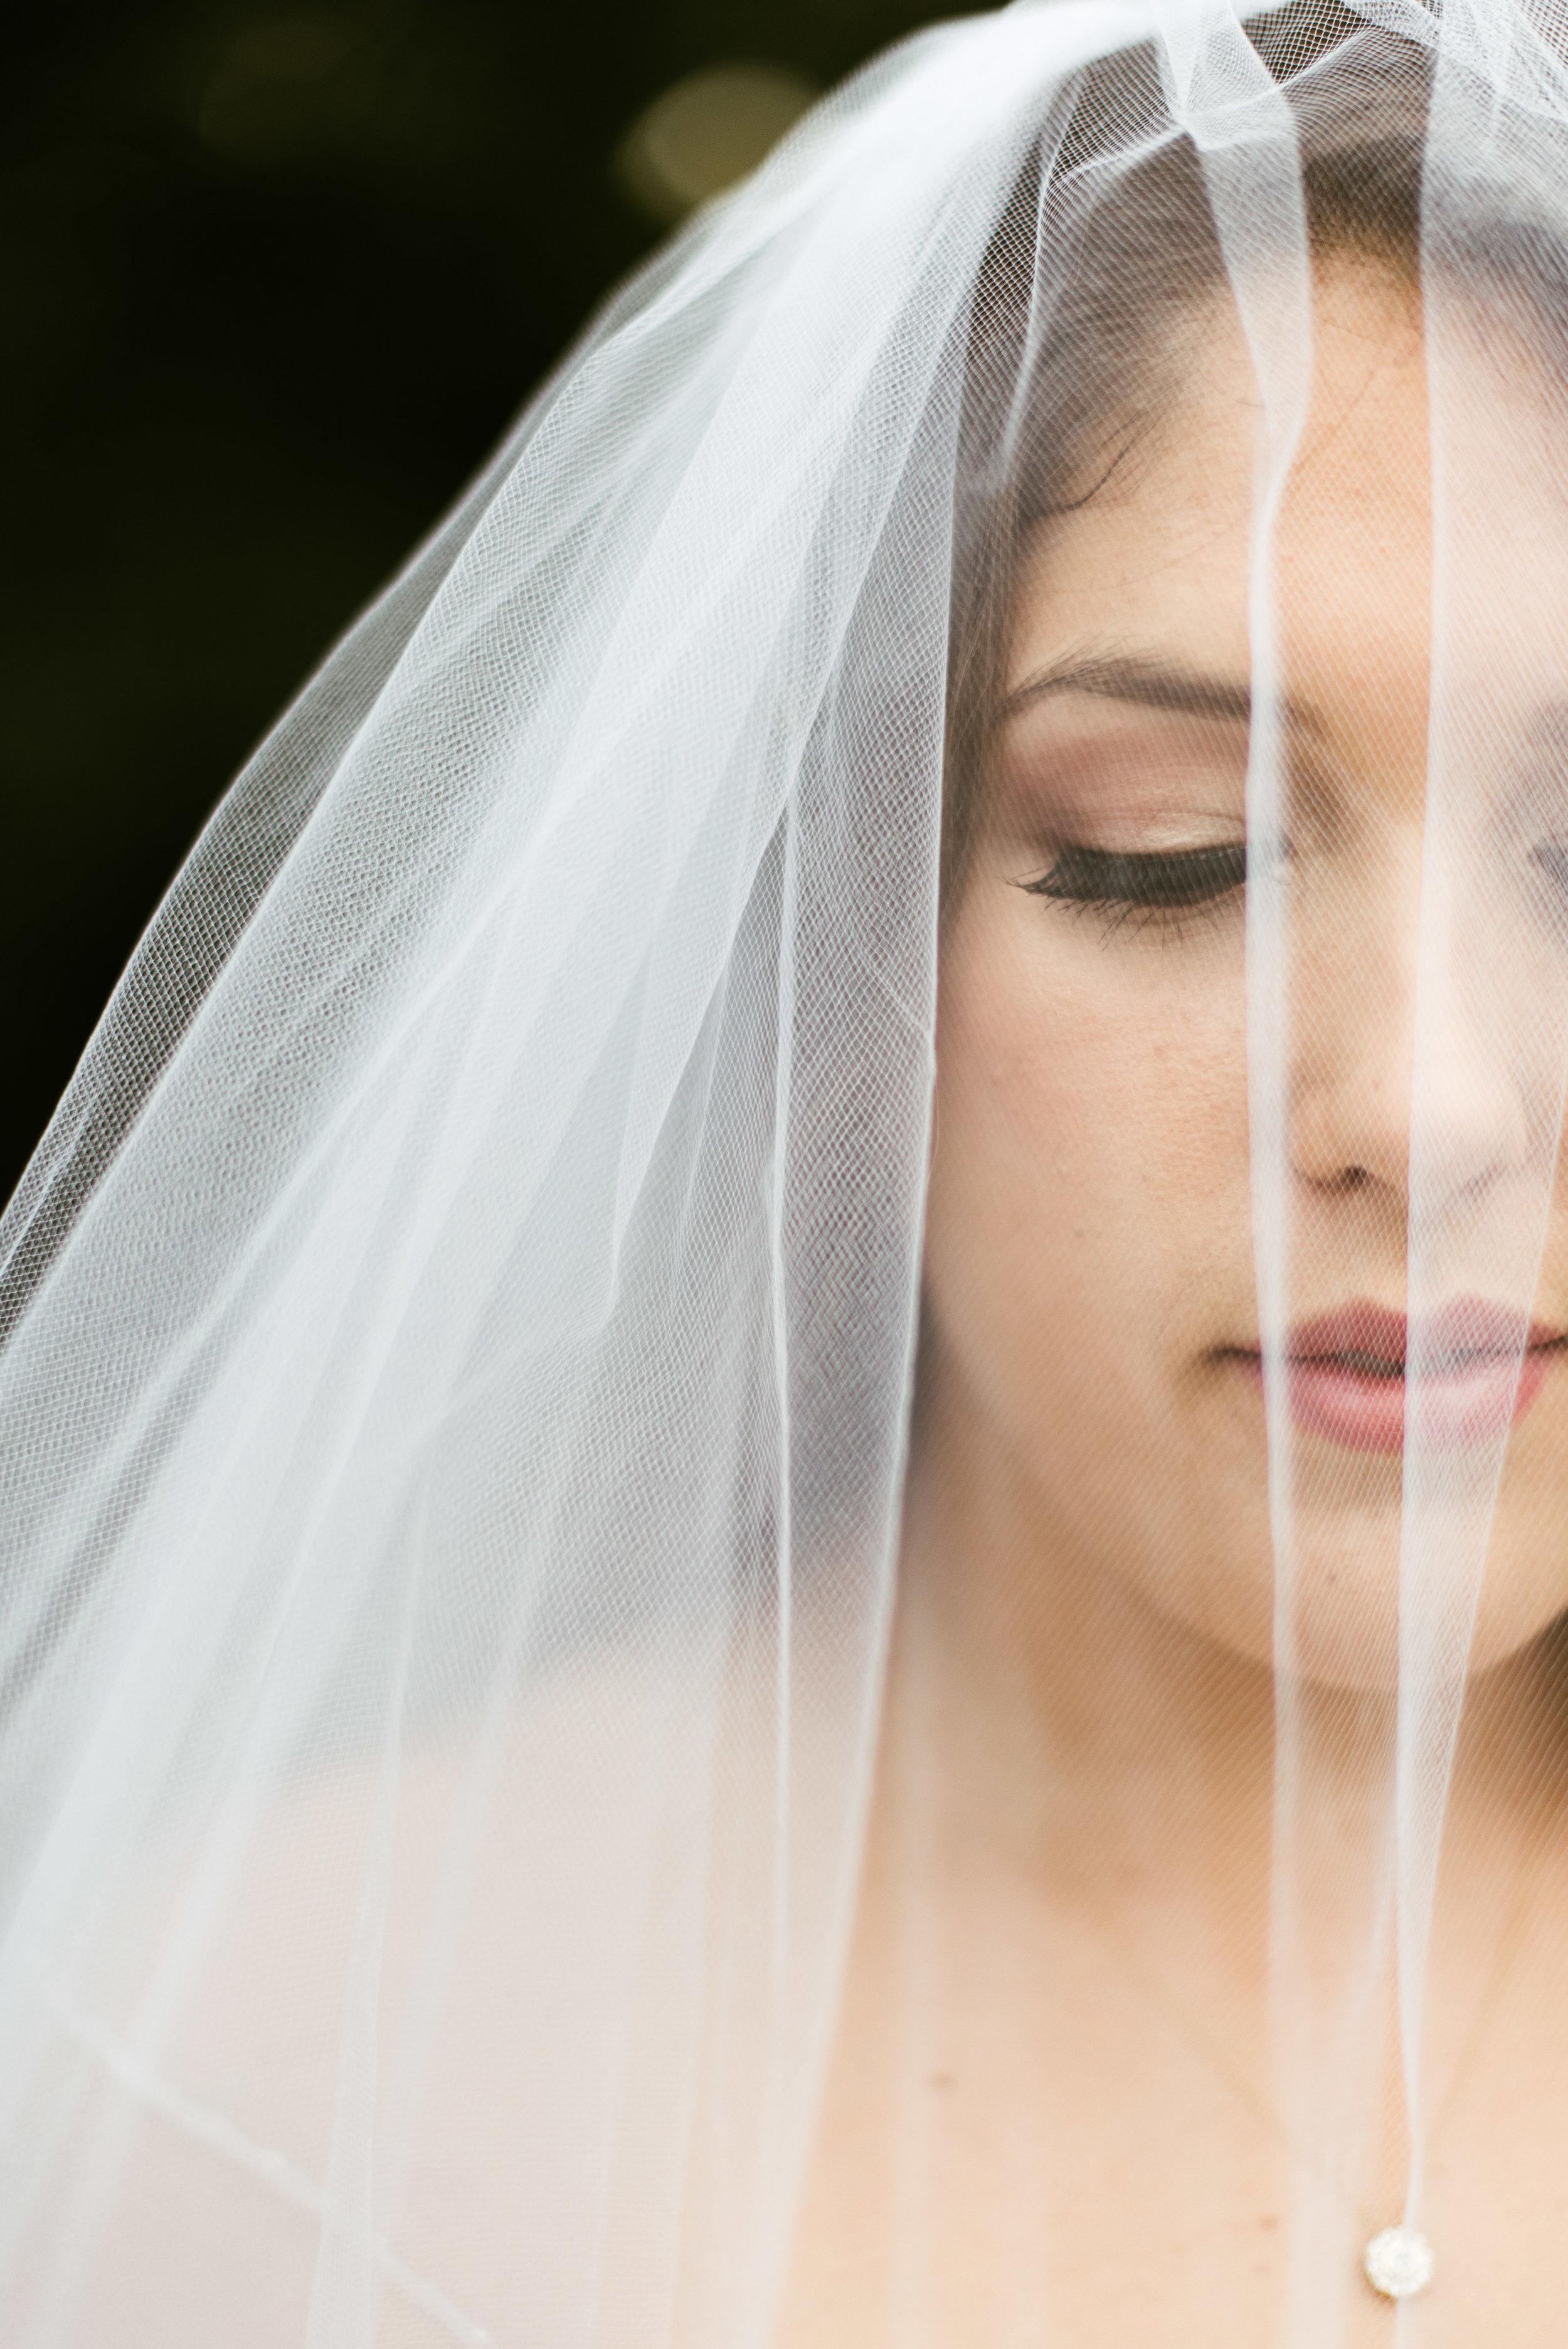 Atascocita Bridal Session | Natural Light Houston Photographer | www.jordanmitchellphotography.com